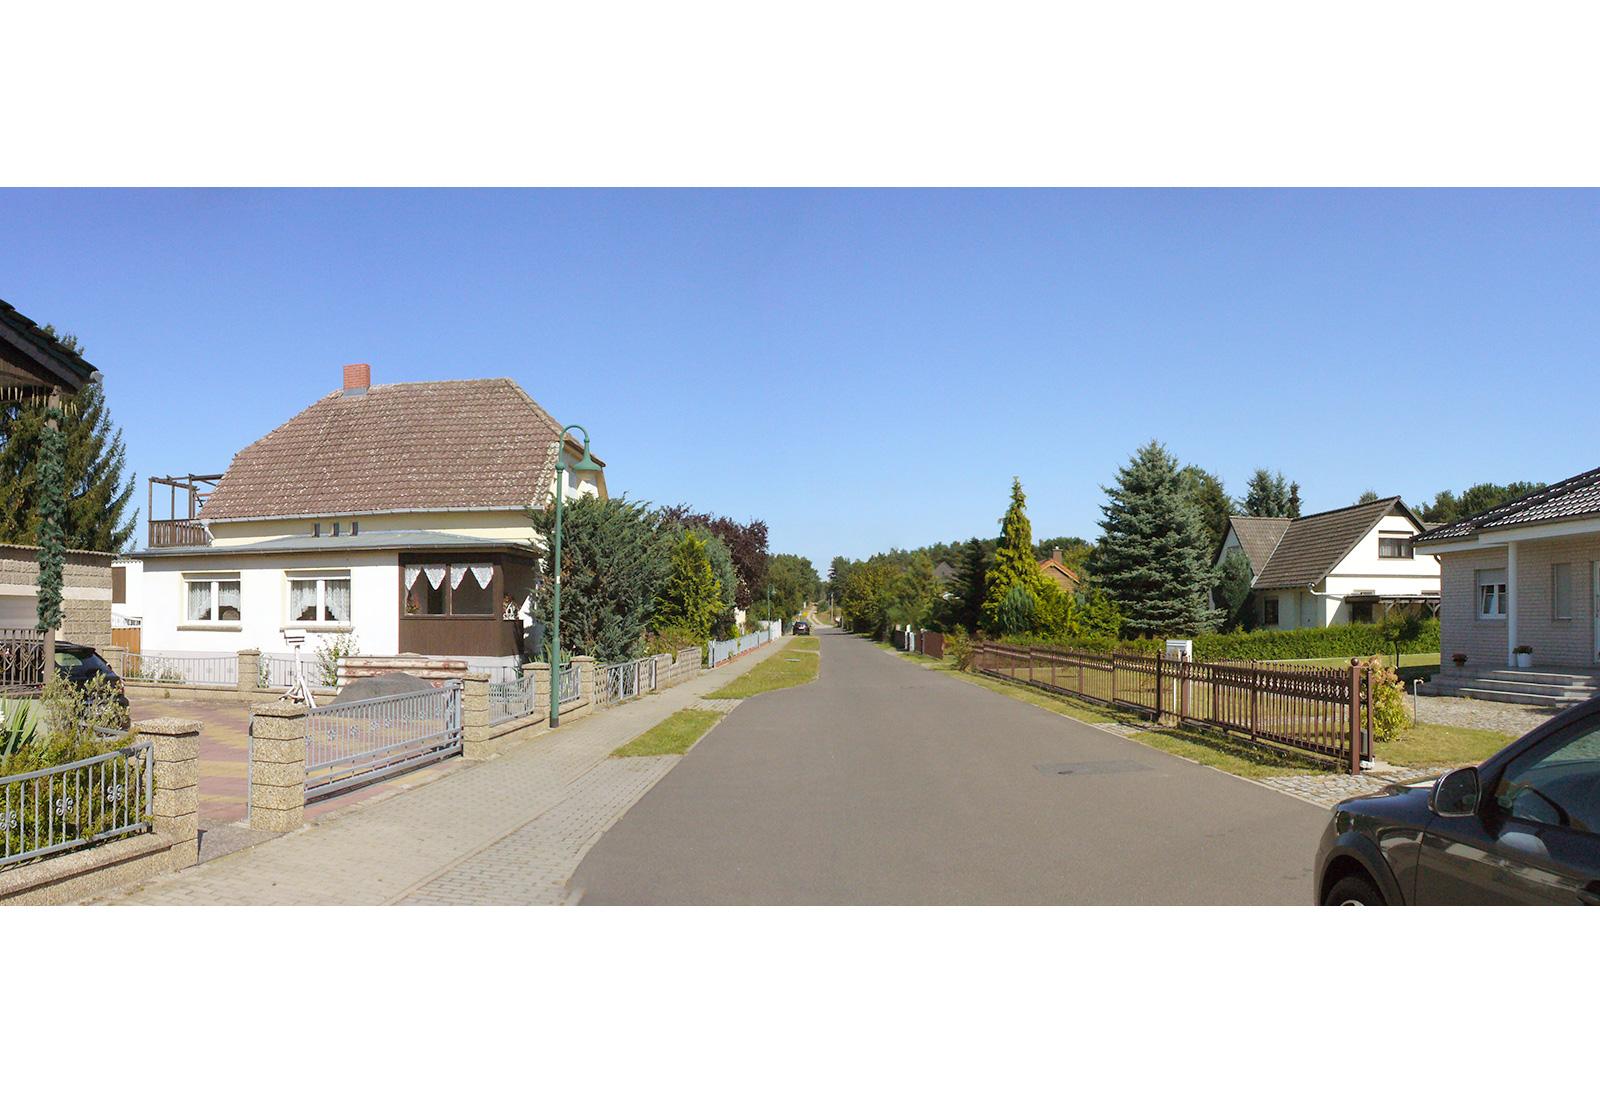 Kloster Lehnin Position 2